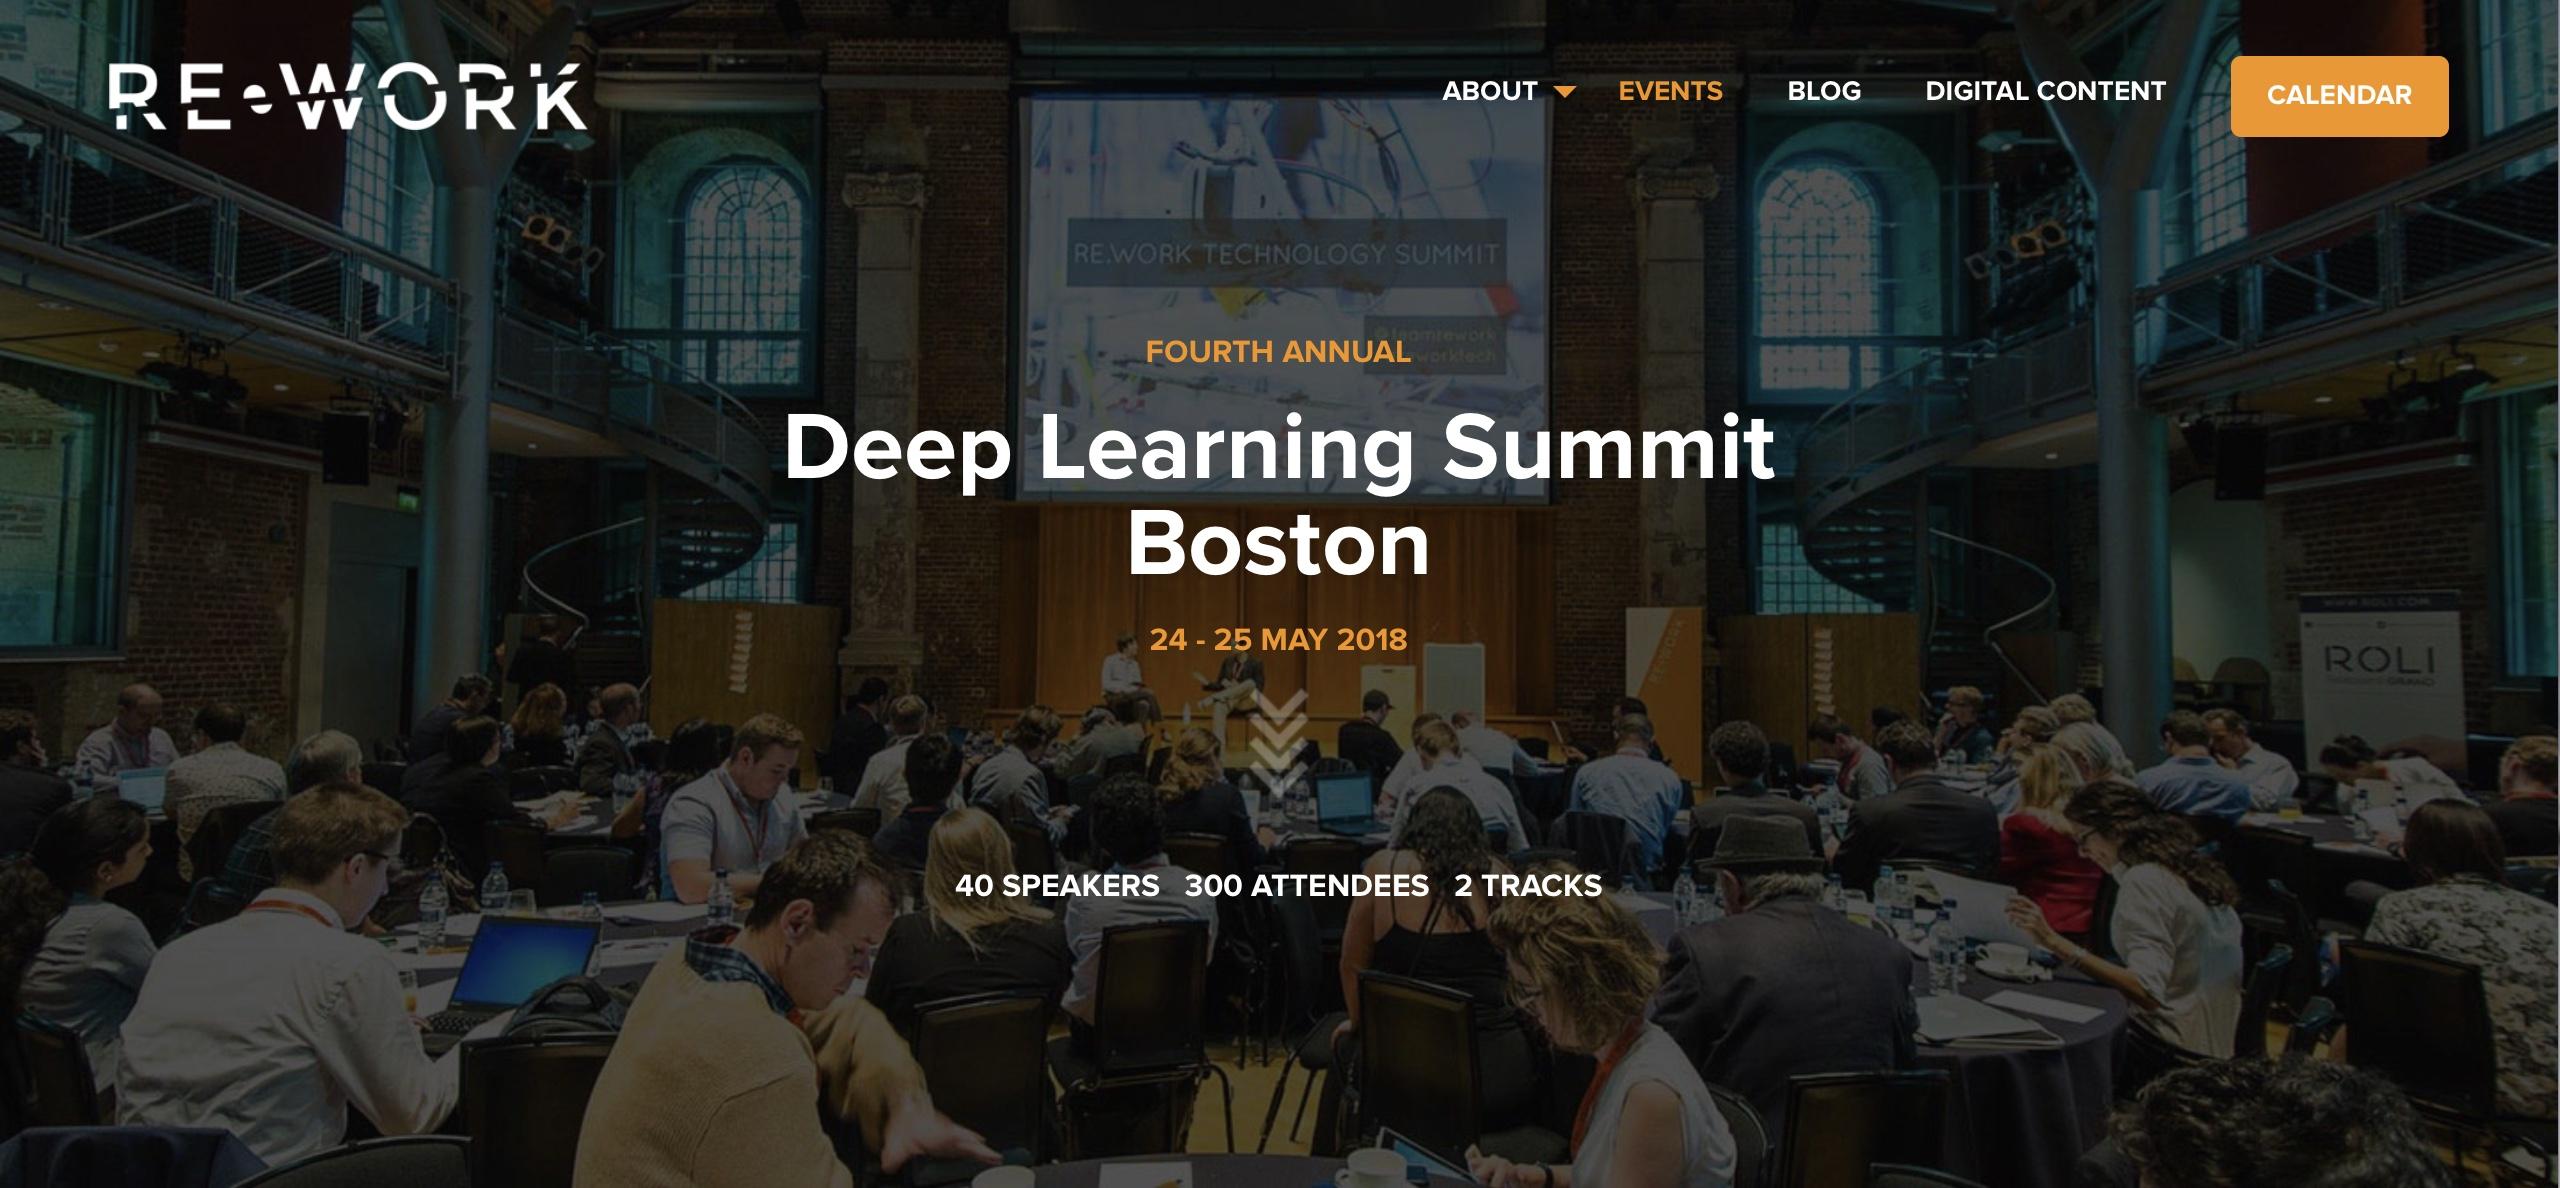 Re-Work Deep Learning Summit Boston – 24-25.5.2018